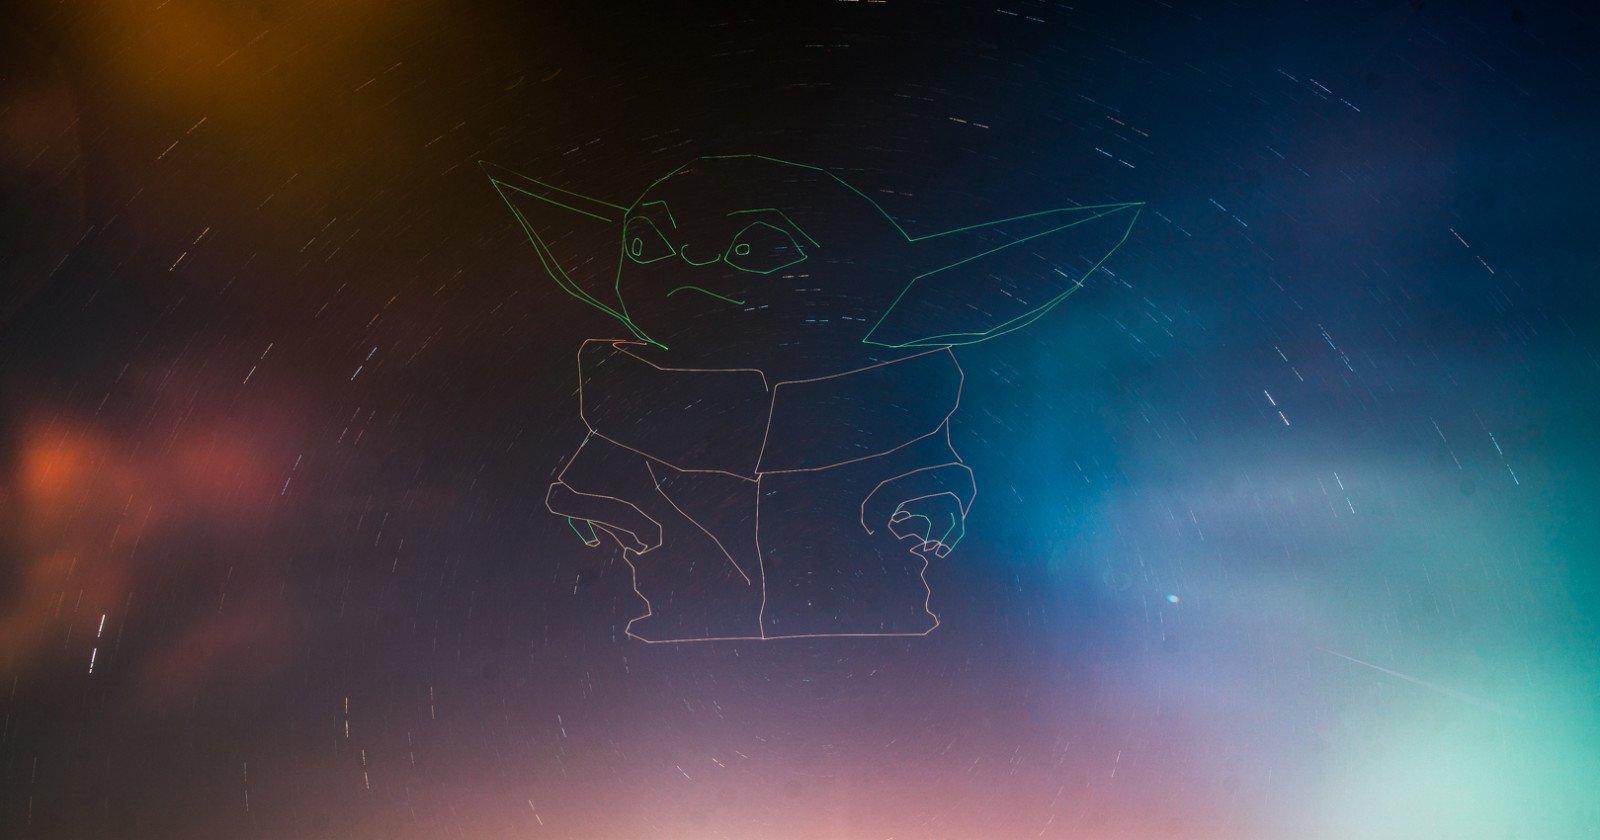 Este fotógrafo usó un zángano para pintar con luz un bebé gigante Yoda en el cielo